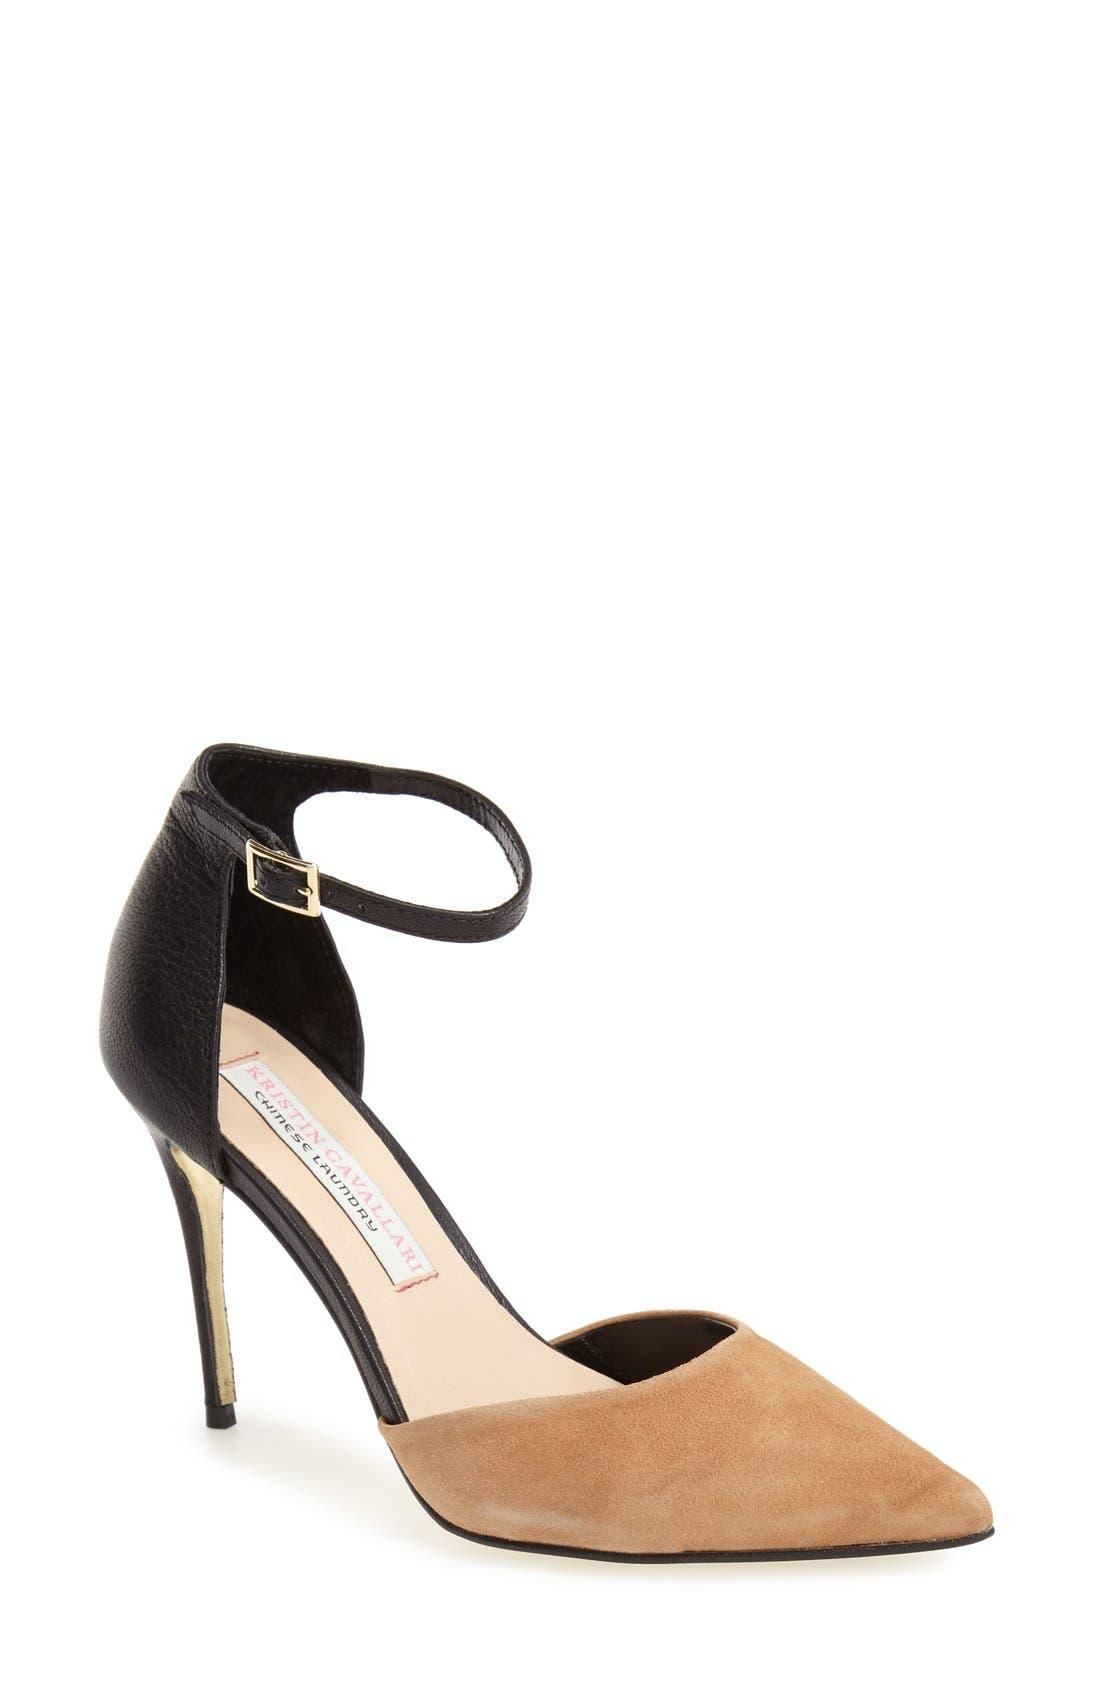 Kristin Cavallari Ankle Strap Pump (Women)